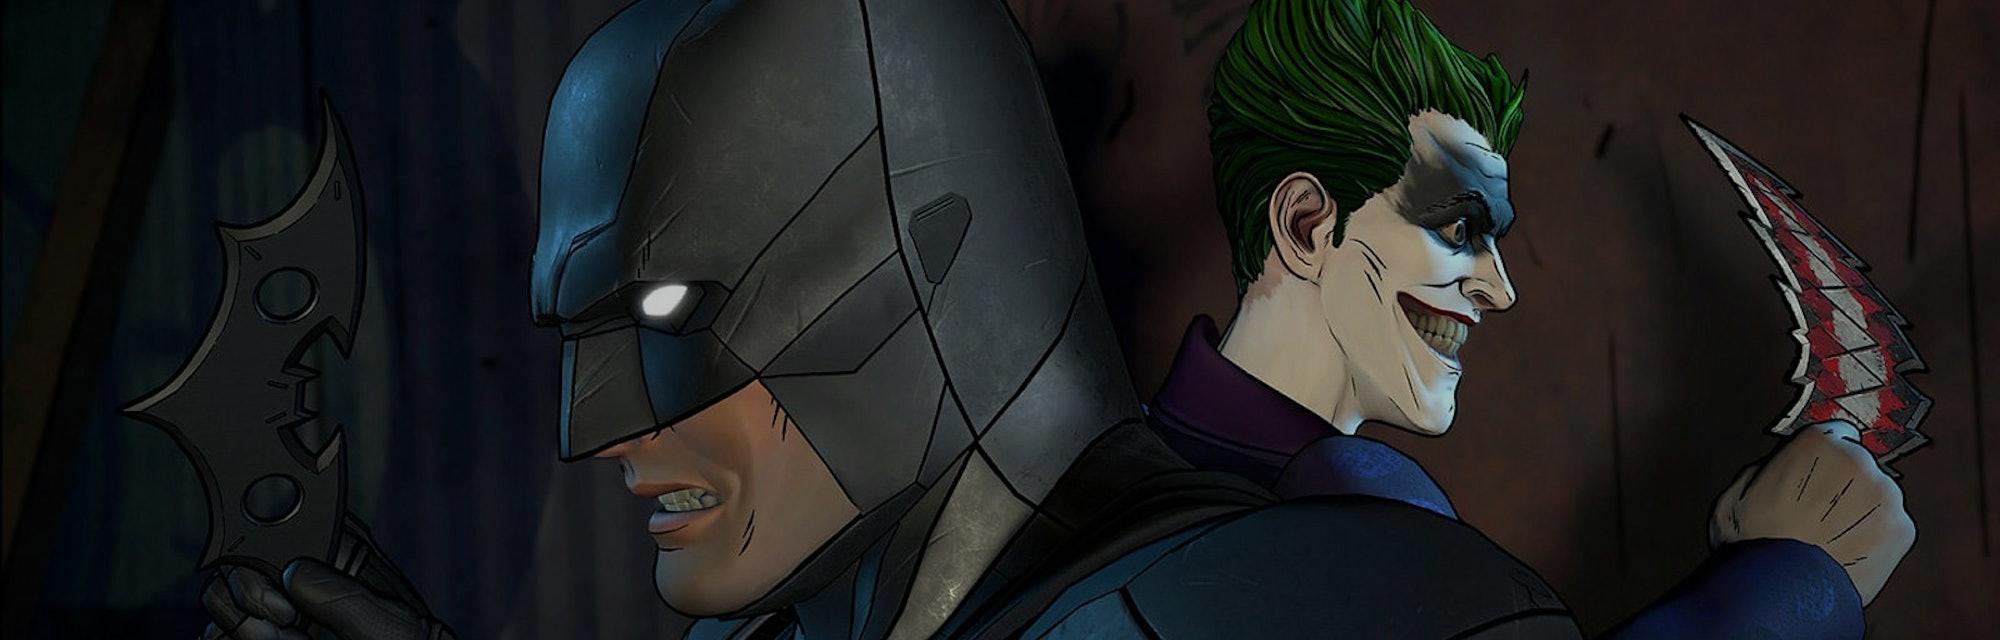 Fortnite Batman Event Leaked Skins Challenges Reveal Best Crossover Yet *joker* como conseguirlo (nuevo pack) baile *gratis* alza la copa ¿skin secreta wolwerine? fortnite batman event leaked skins